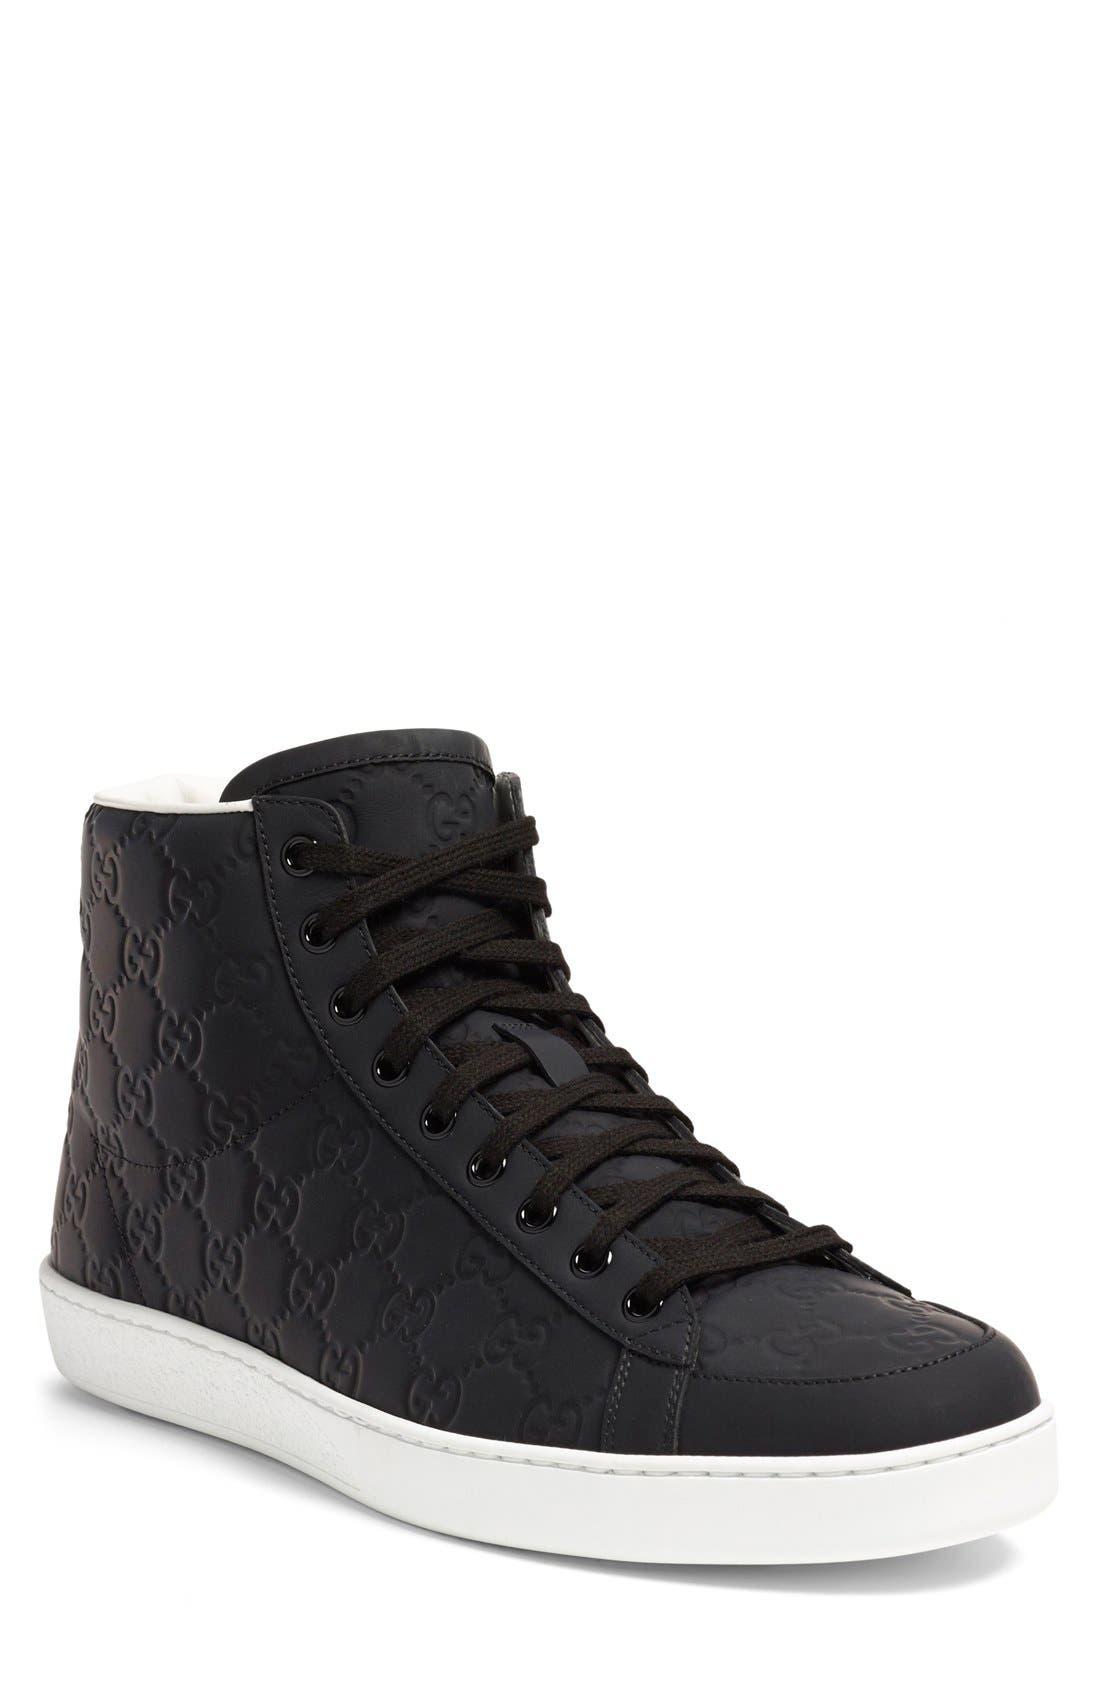 'Brooklyn' High-Top Sneaker,                             Main thumbnail 1, color,                             001